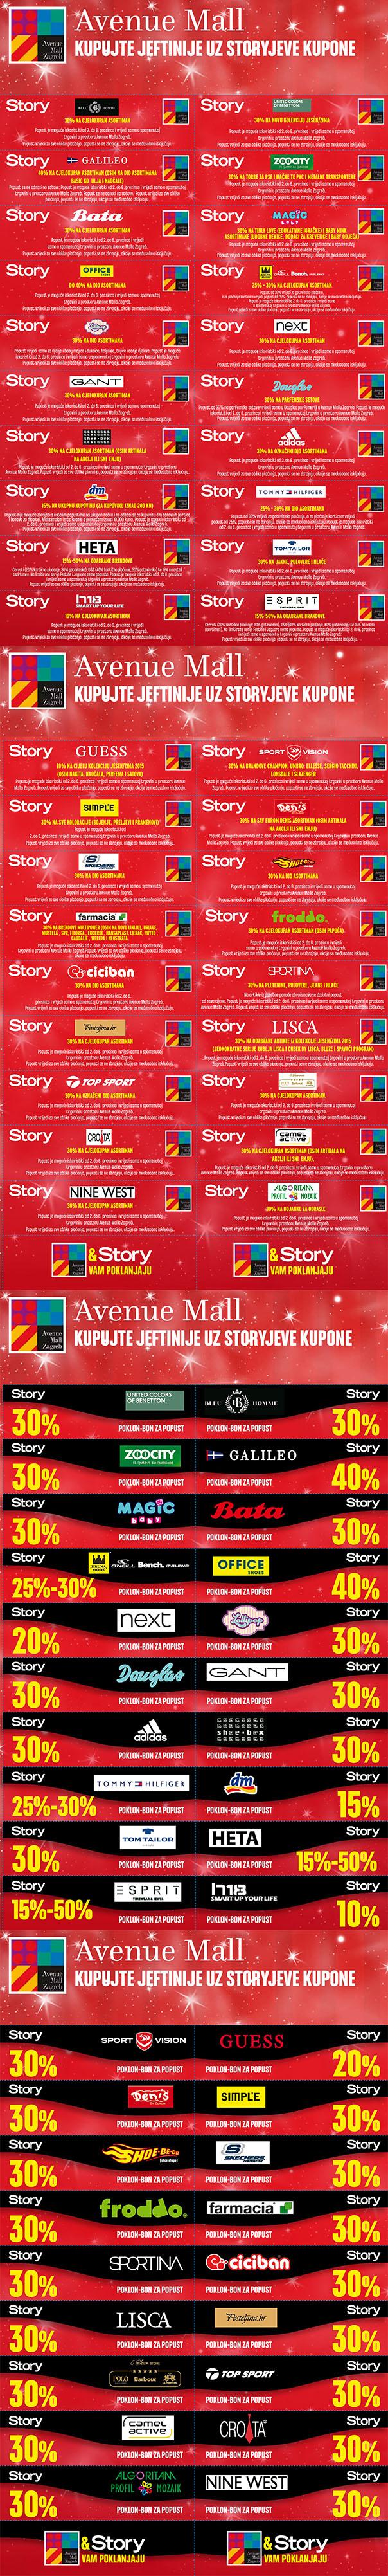 Story kuponi za Avenue Mall prosinac 2015